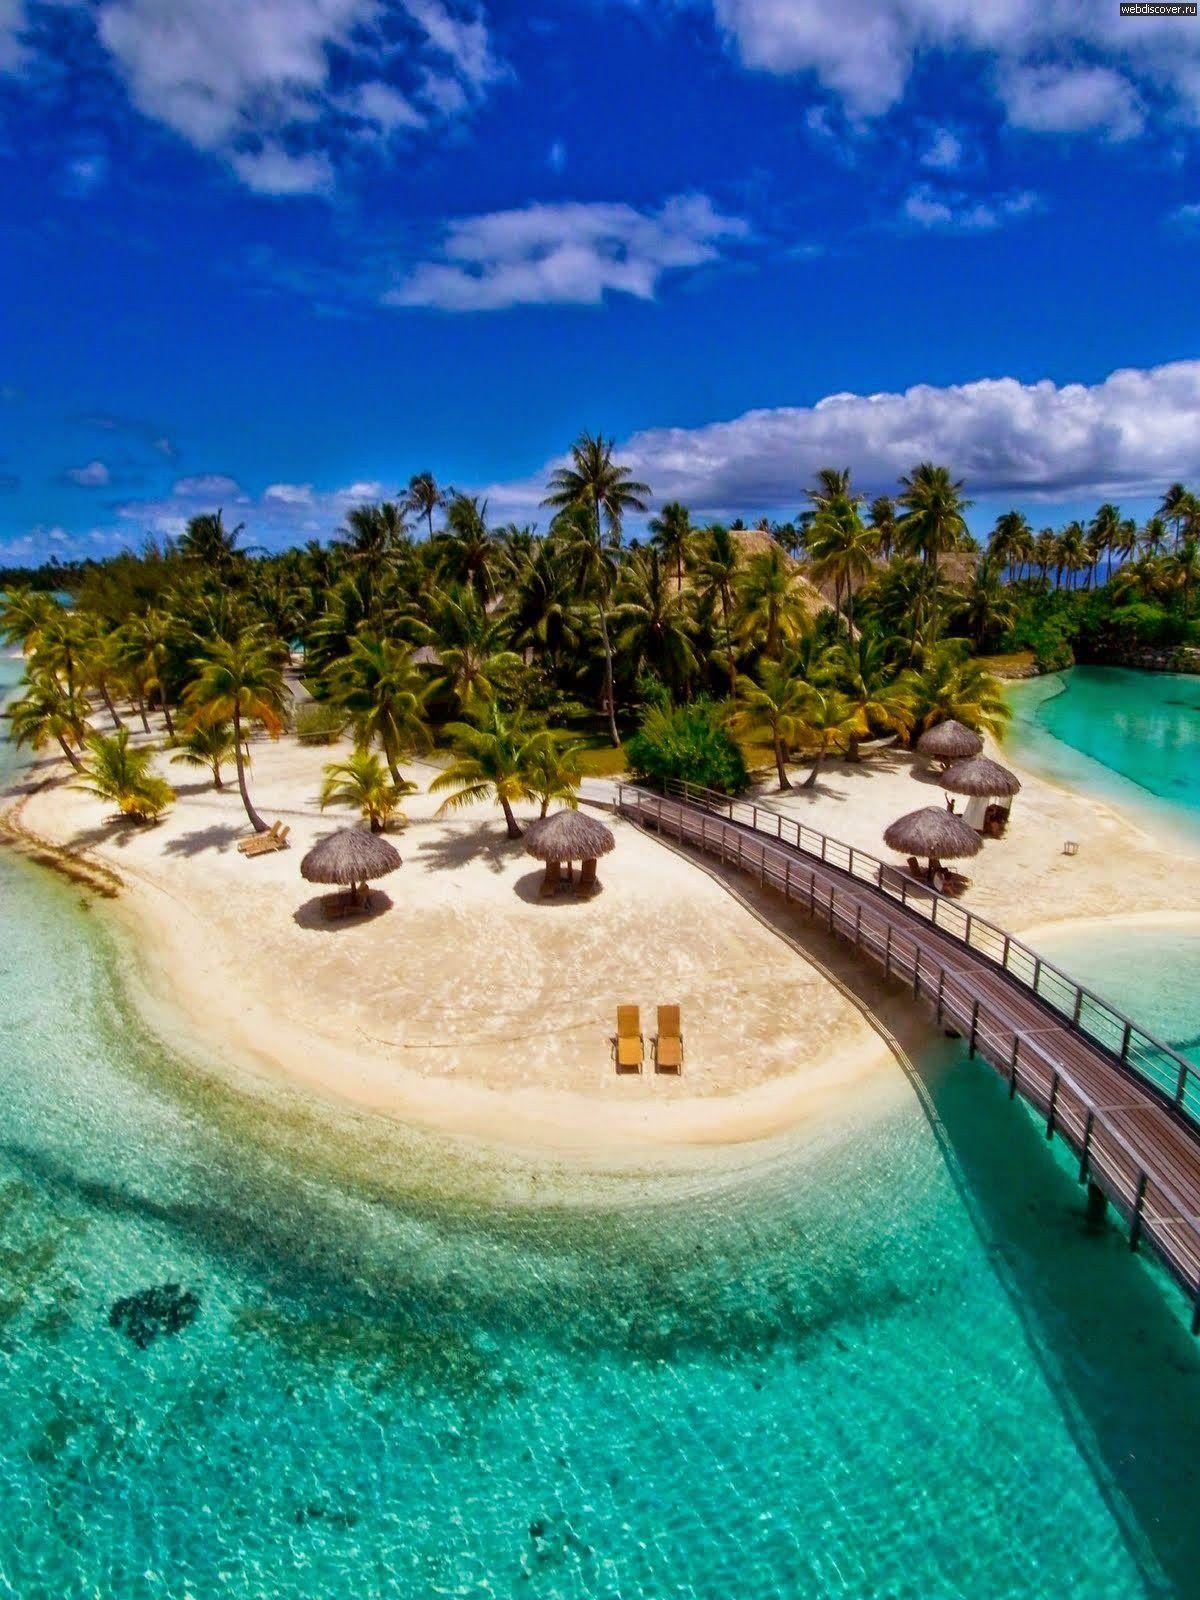 Bahamas Atlantic Ocean 10 Most Beautiful Island Countries In The World